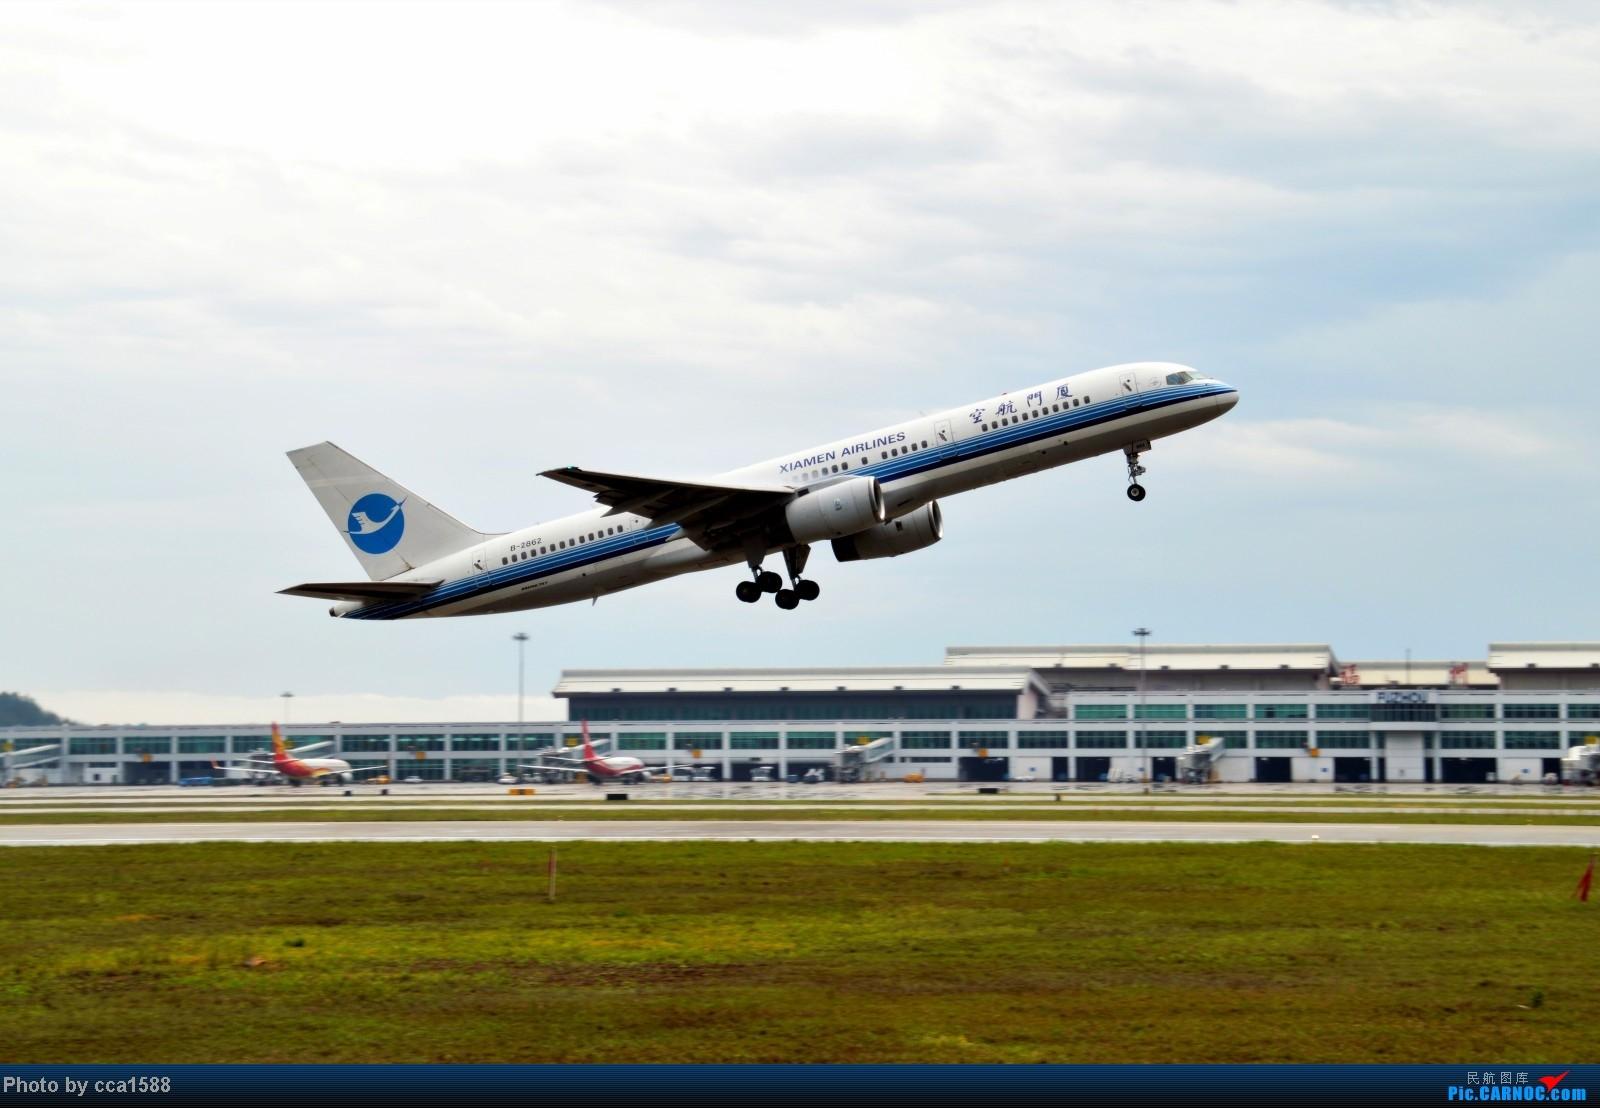 Re:[原创]4.26FOC拍机--烂天出好机,各种奇葩货~~ BOEING 757-200 B-2862 中国福州长乐机场